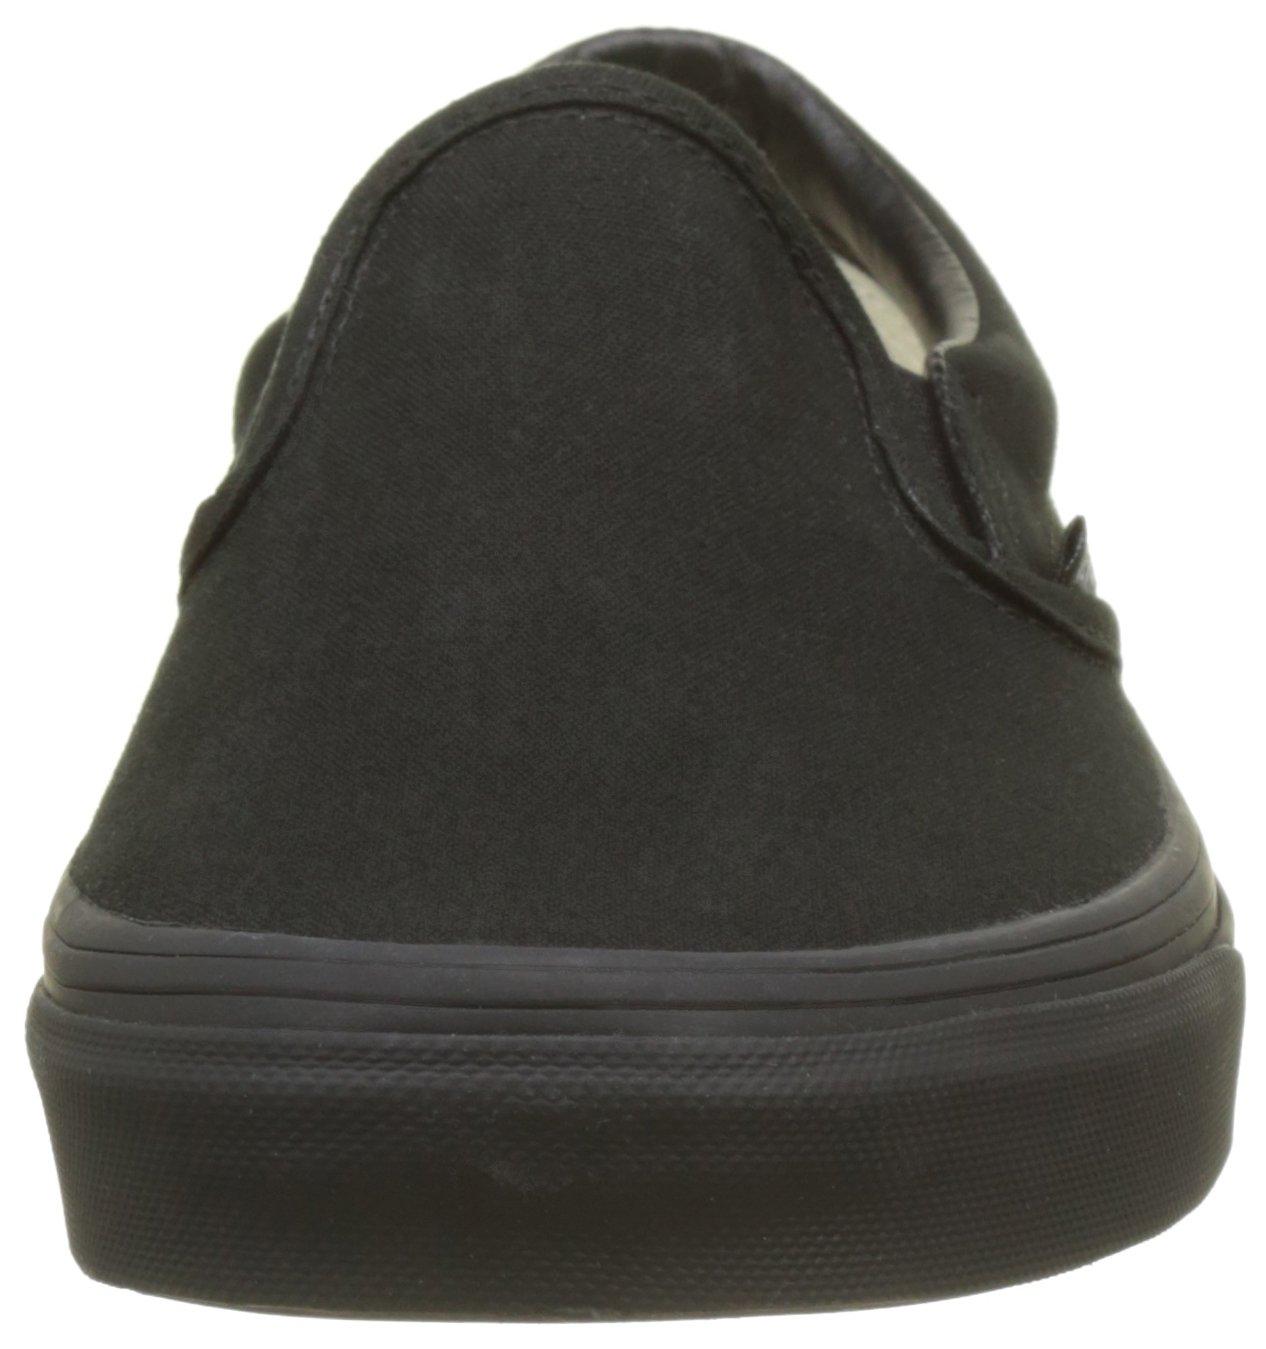 Vans Unisex-Erwachsene Classic Slip-On (schwarz/schwarz Niedrig-Top, Weiß, D(M) Schwarz (schwarz/schwarz Slip-On Bka) 3a3dd0